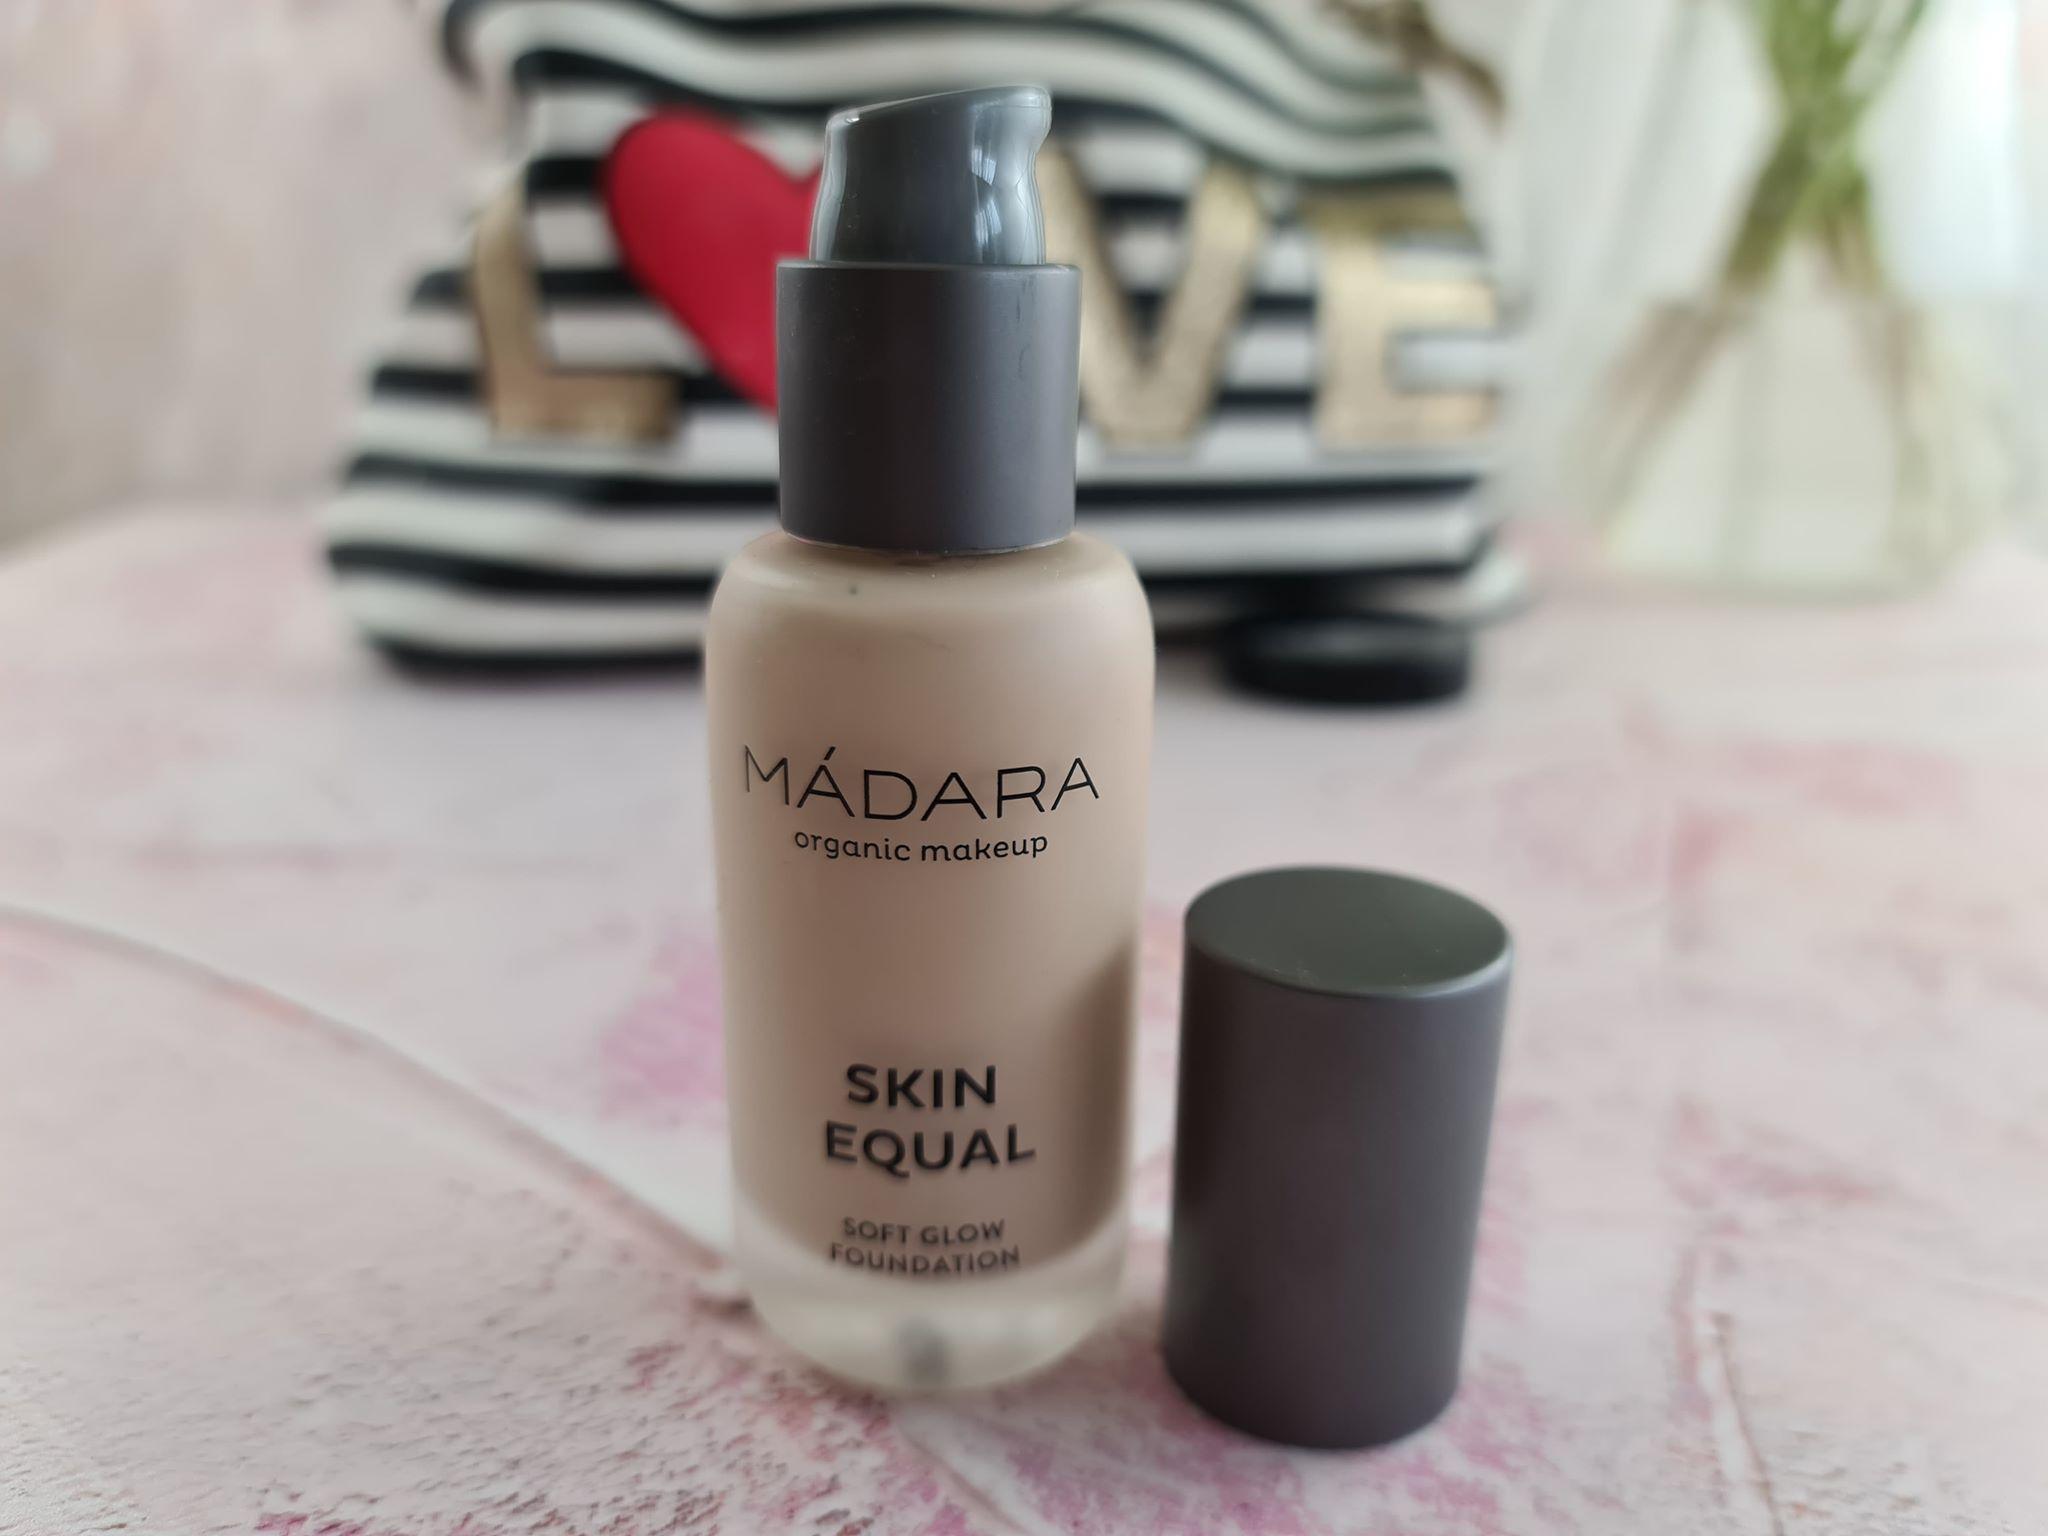 Madara Skin Equal Soft Glow Foundation - #20 Ivory review